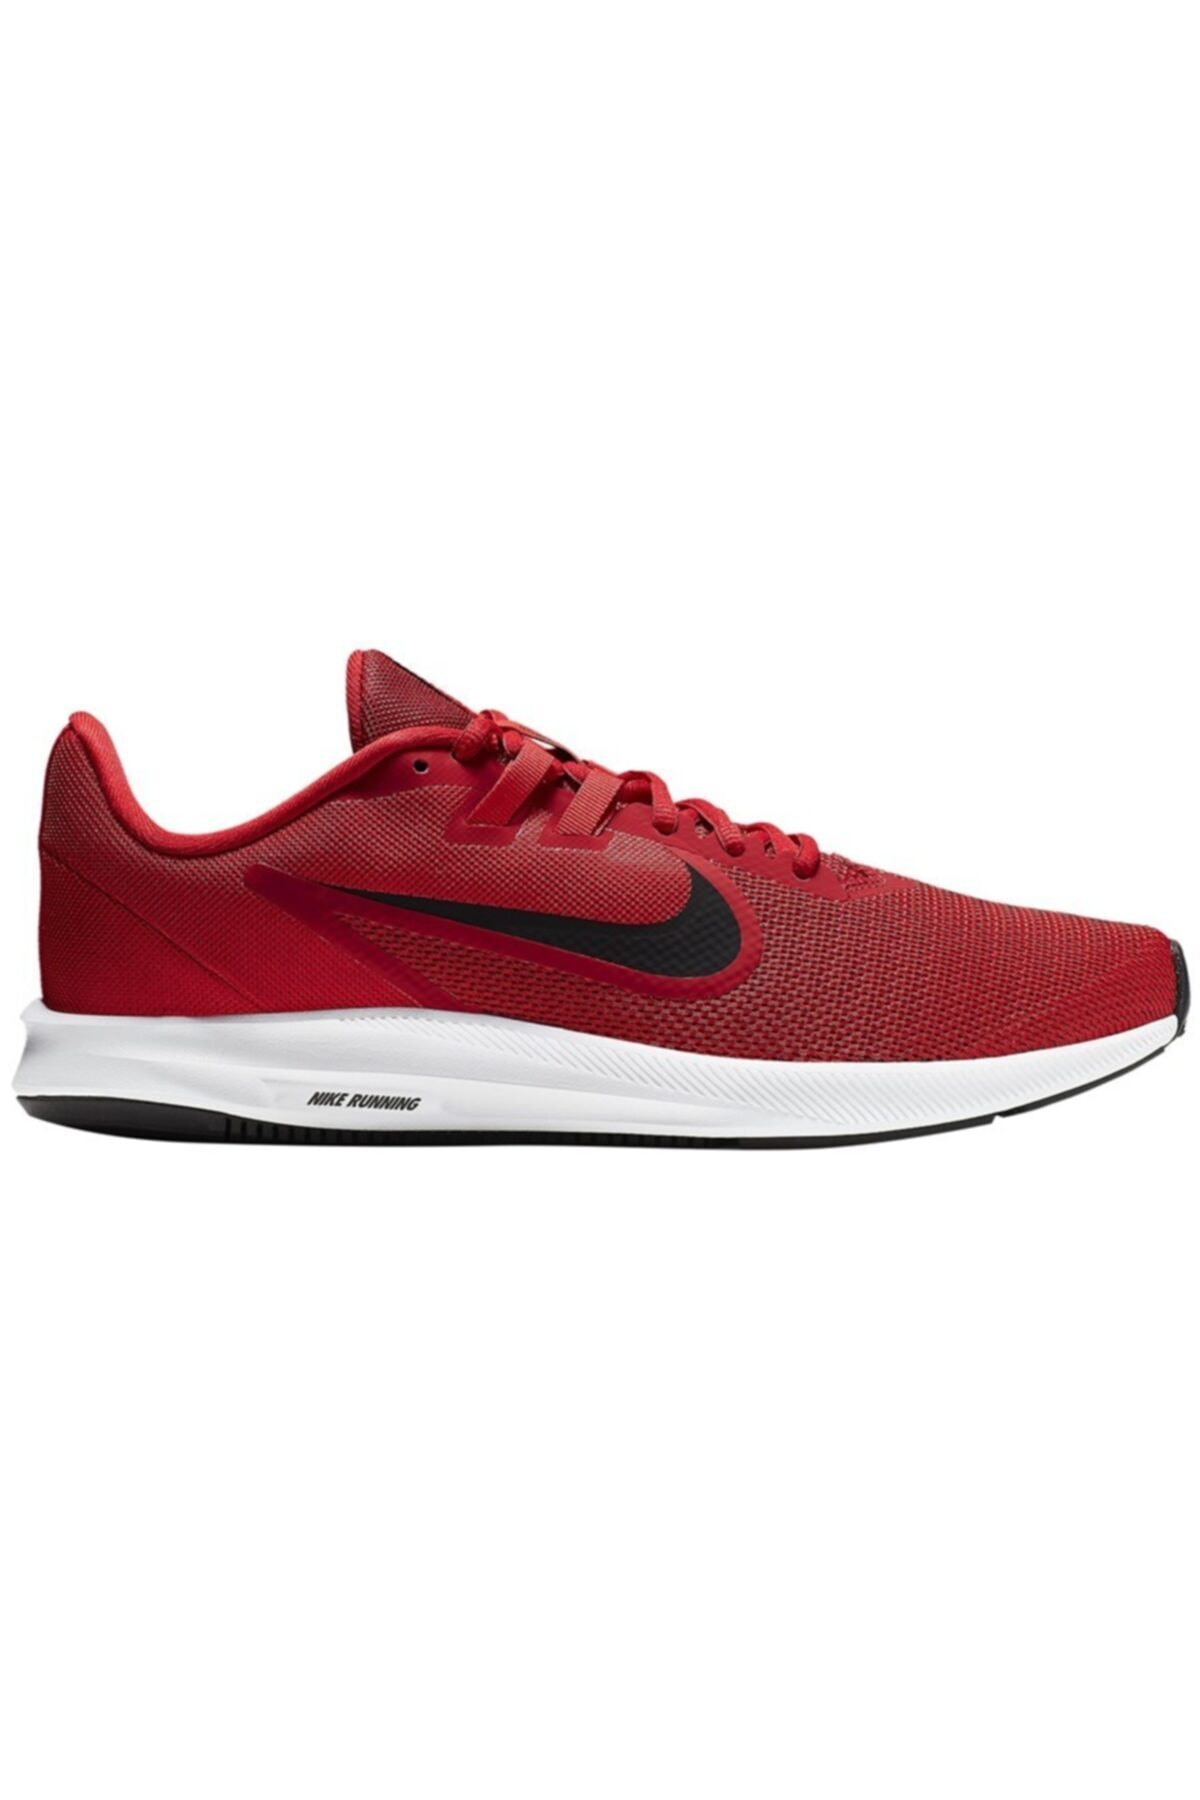 Nike Downshıfter 9 {gs} - Ar4135-600 1